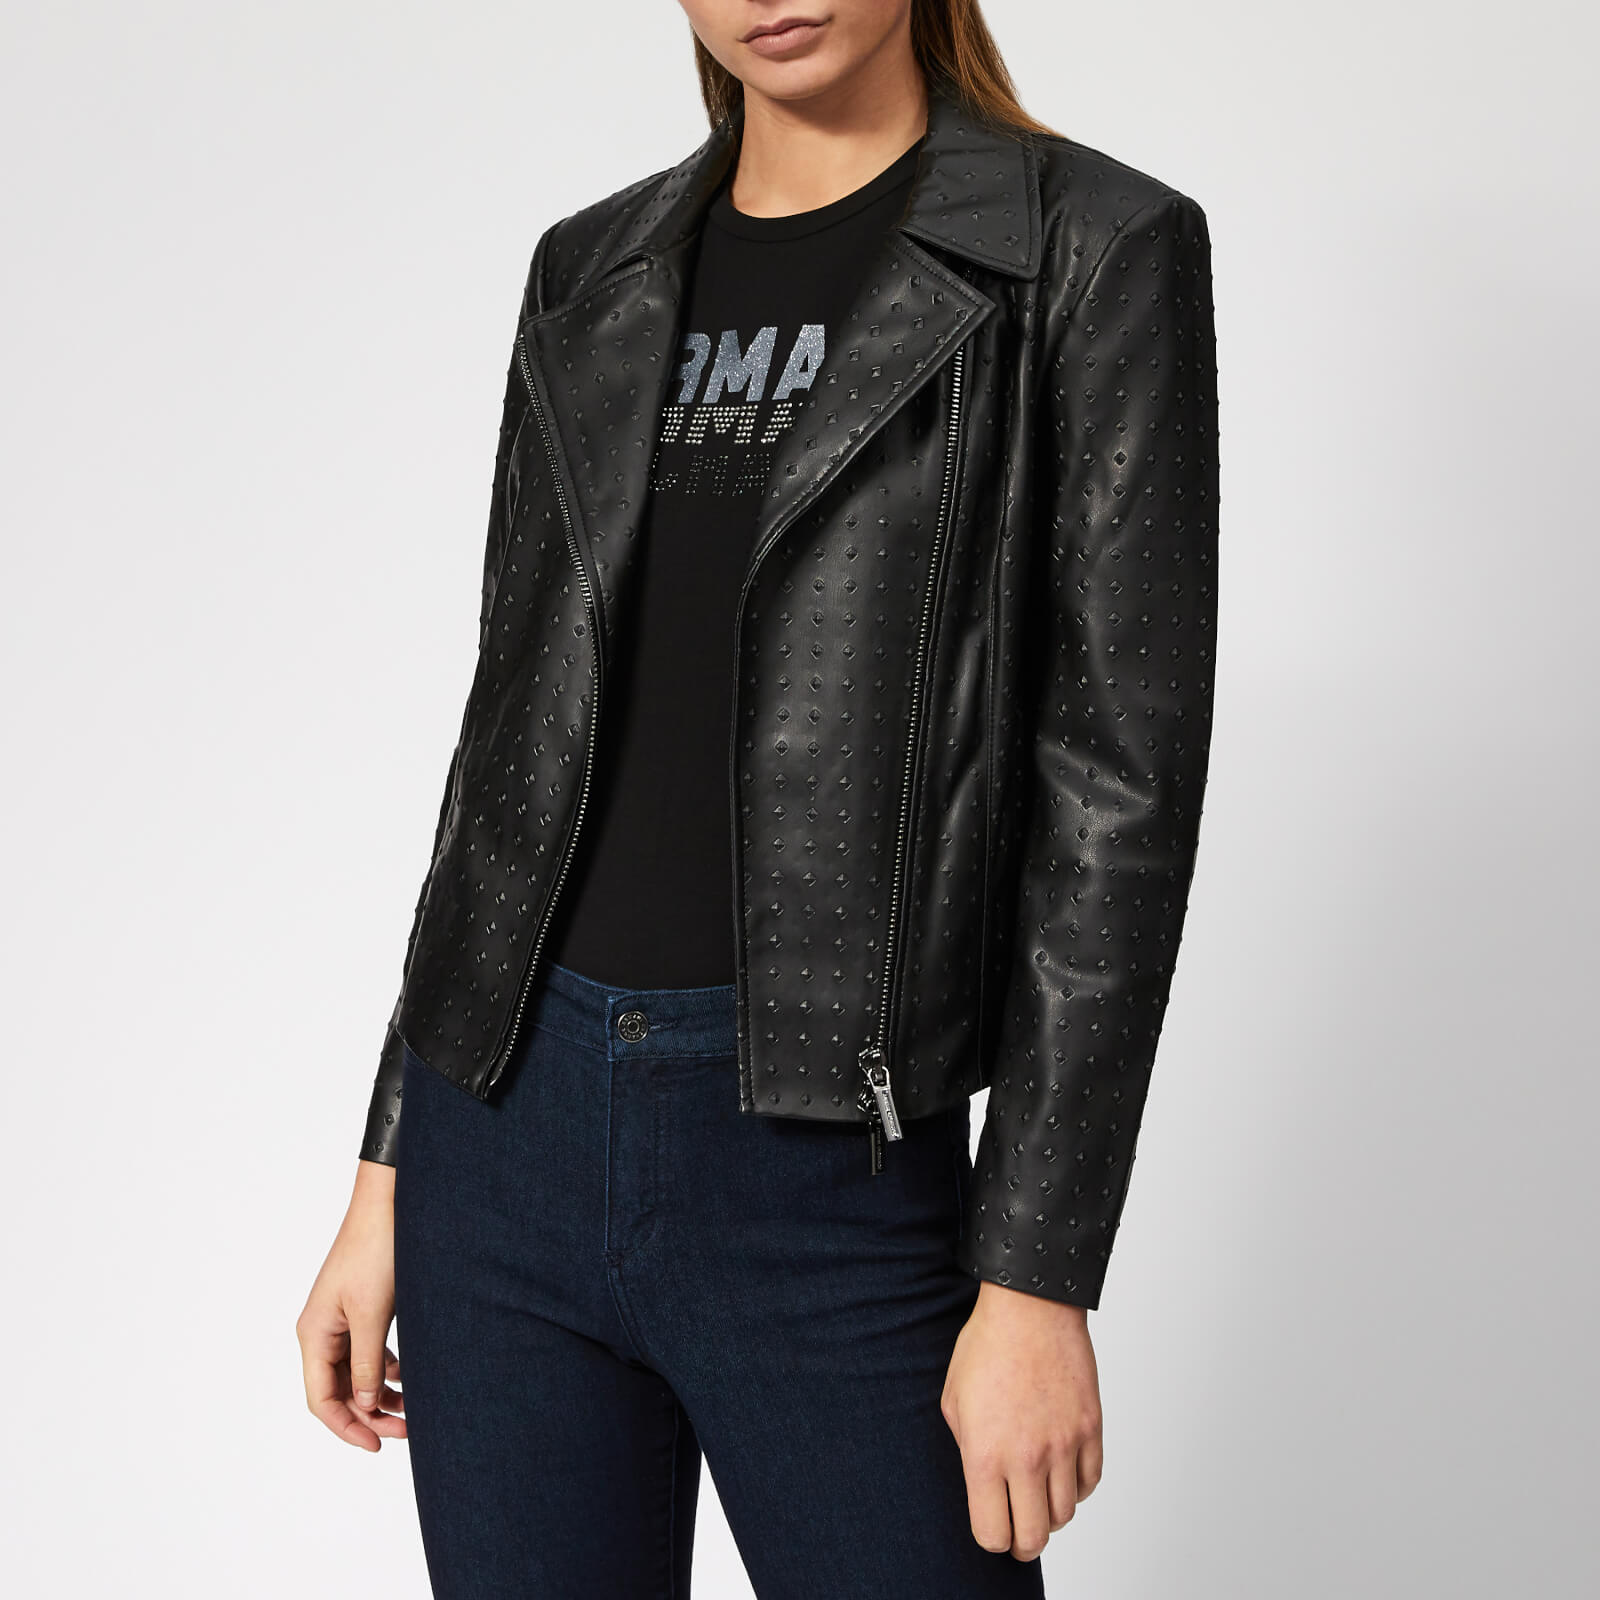 f6eaf14e5 Armani Exchange Women's Biker Jacket - Black Womens Clothing ...